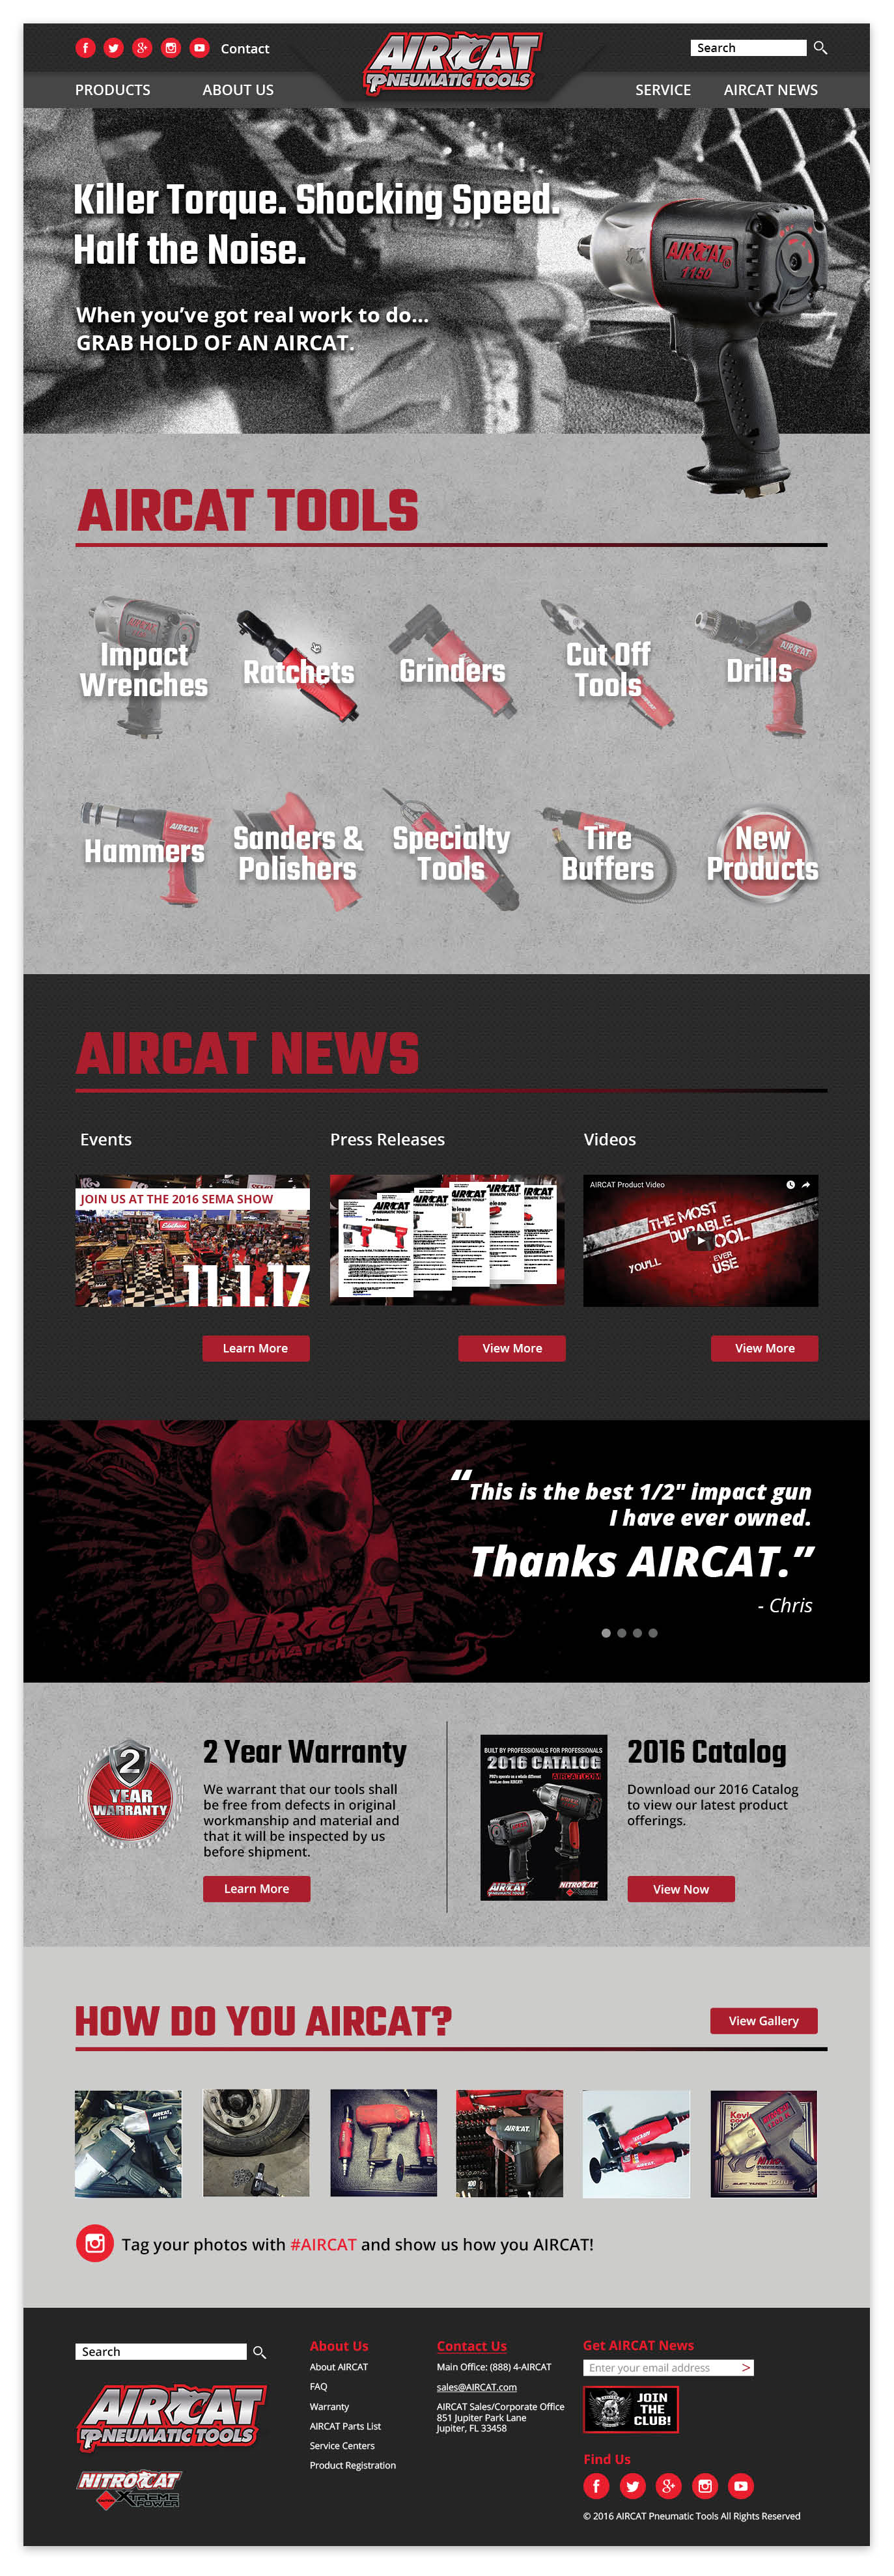 AIRCAT Homepage